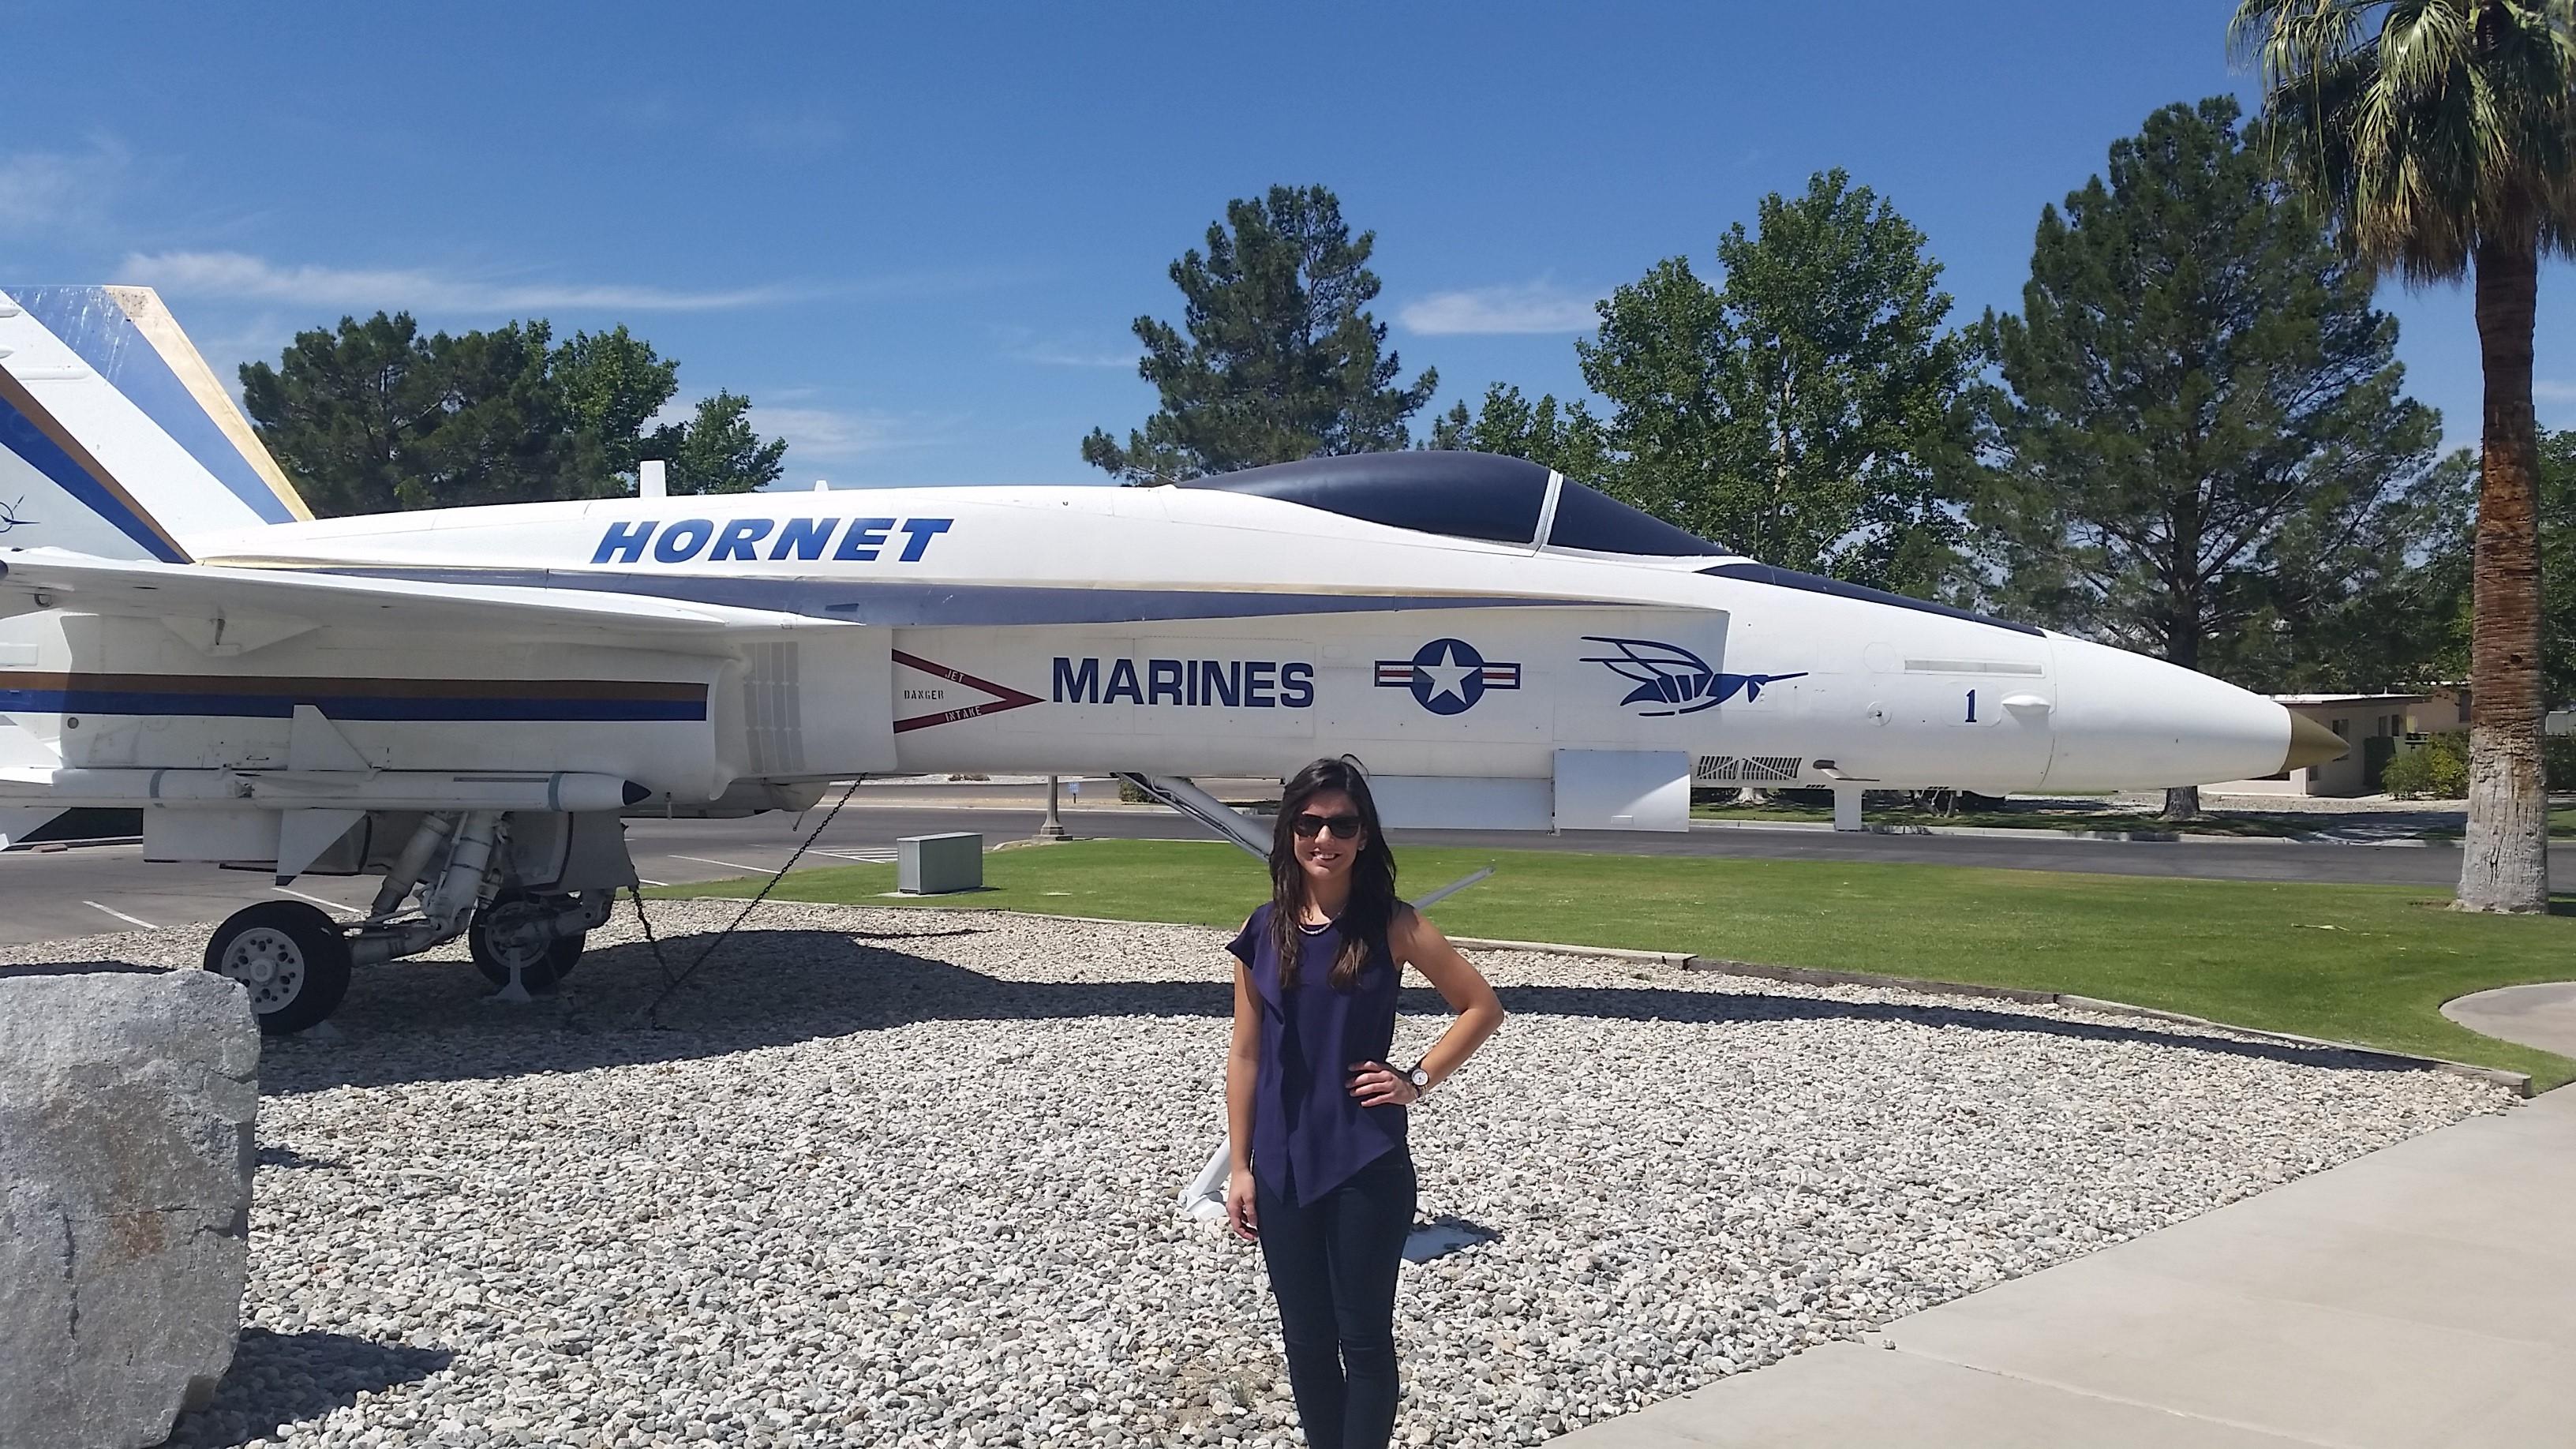 Karina Quintana, flight test engineer at Boeing, by Hornet aircraft.